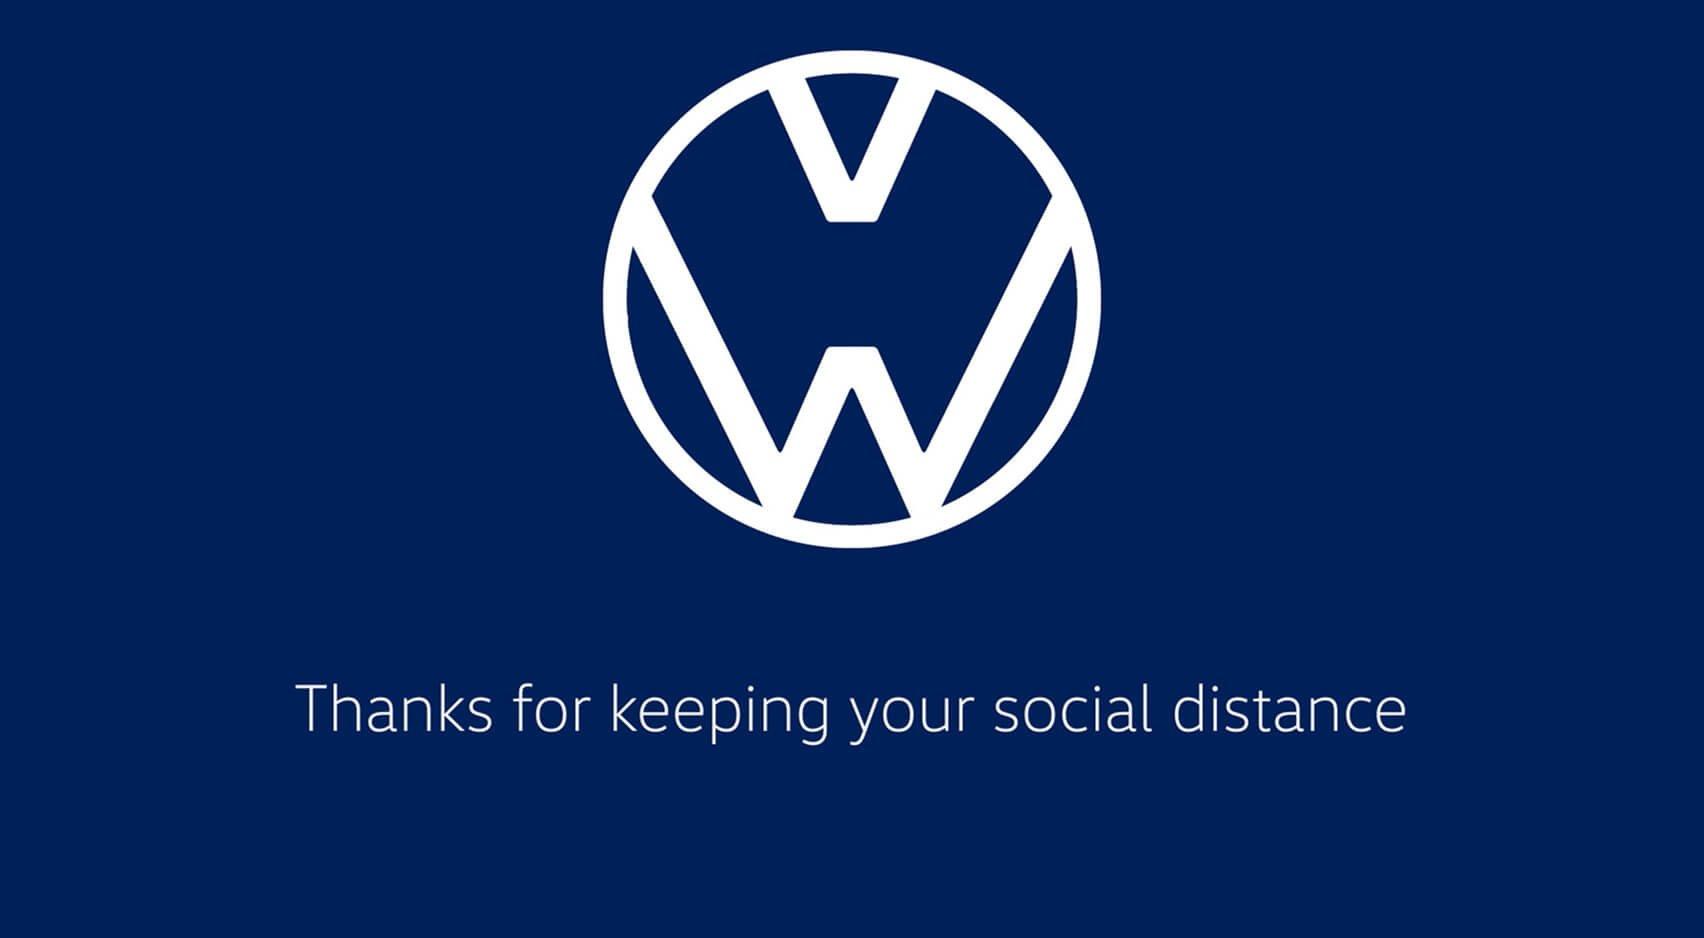 Volkswagen promueve la distancia social ante coronavirus